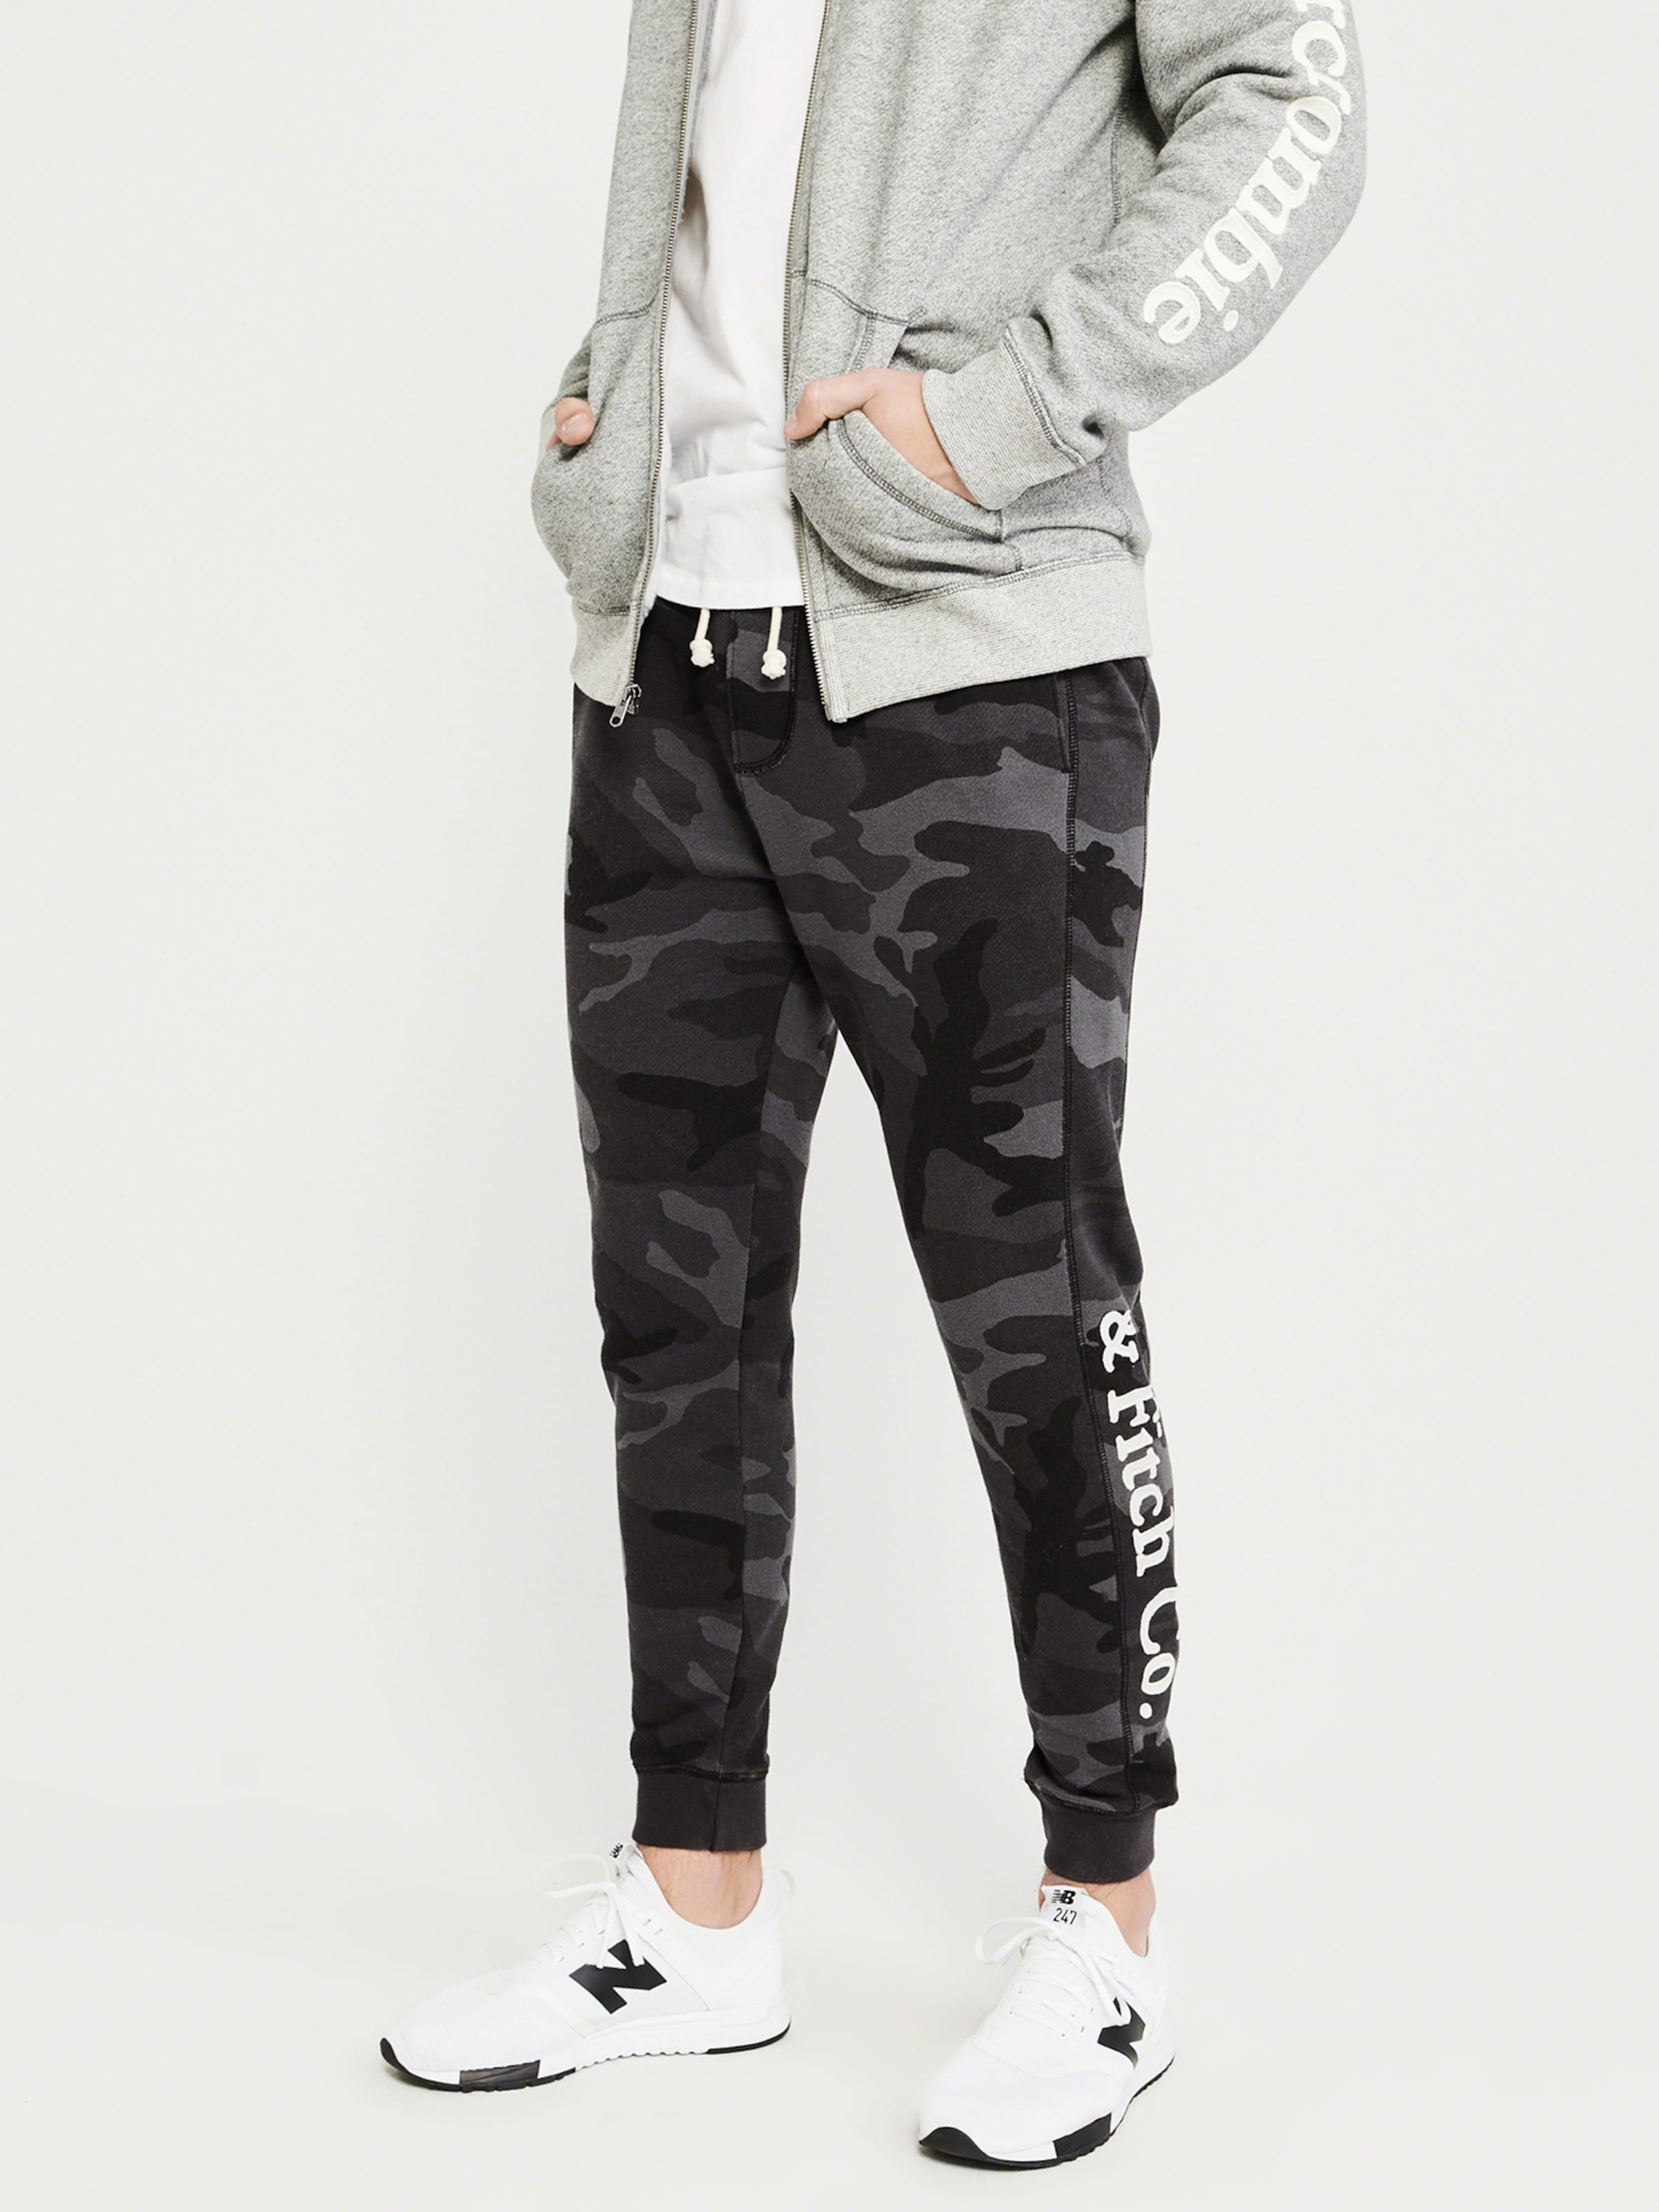 Abercrombieamp; Pantalon Fitch En AnthraciteNoir Abercrombieamp; 29IEDH